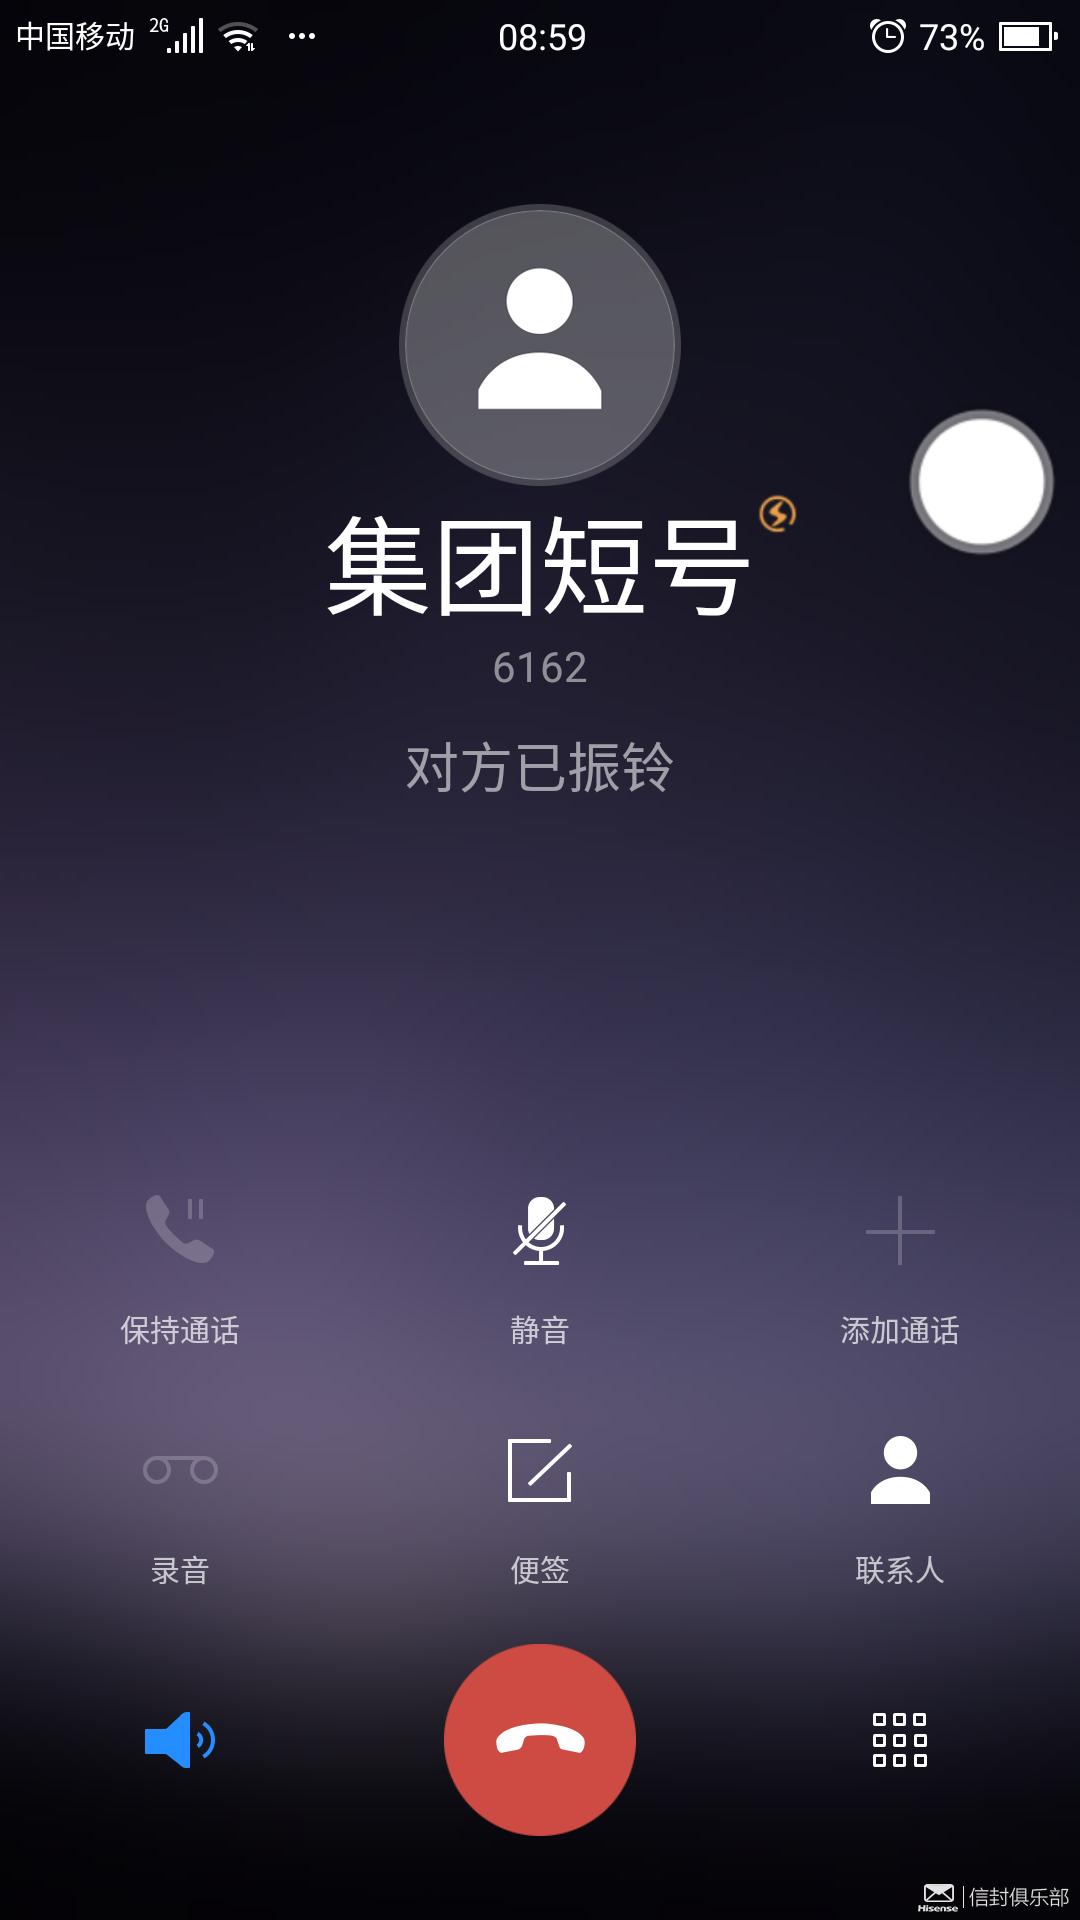 Screenshot_20180223-085928_电话.png